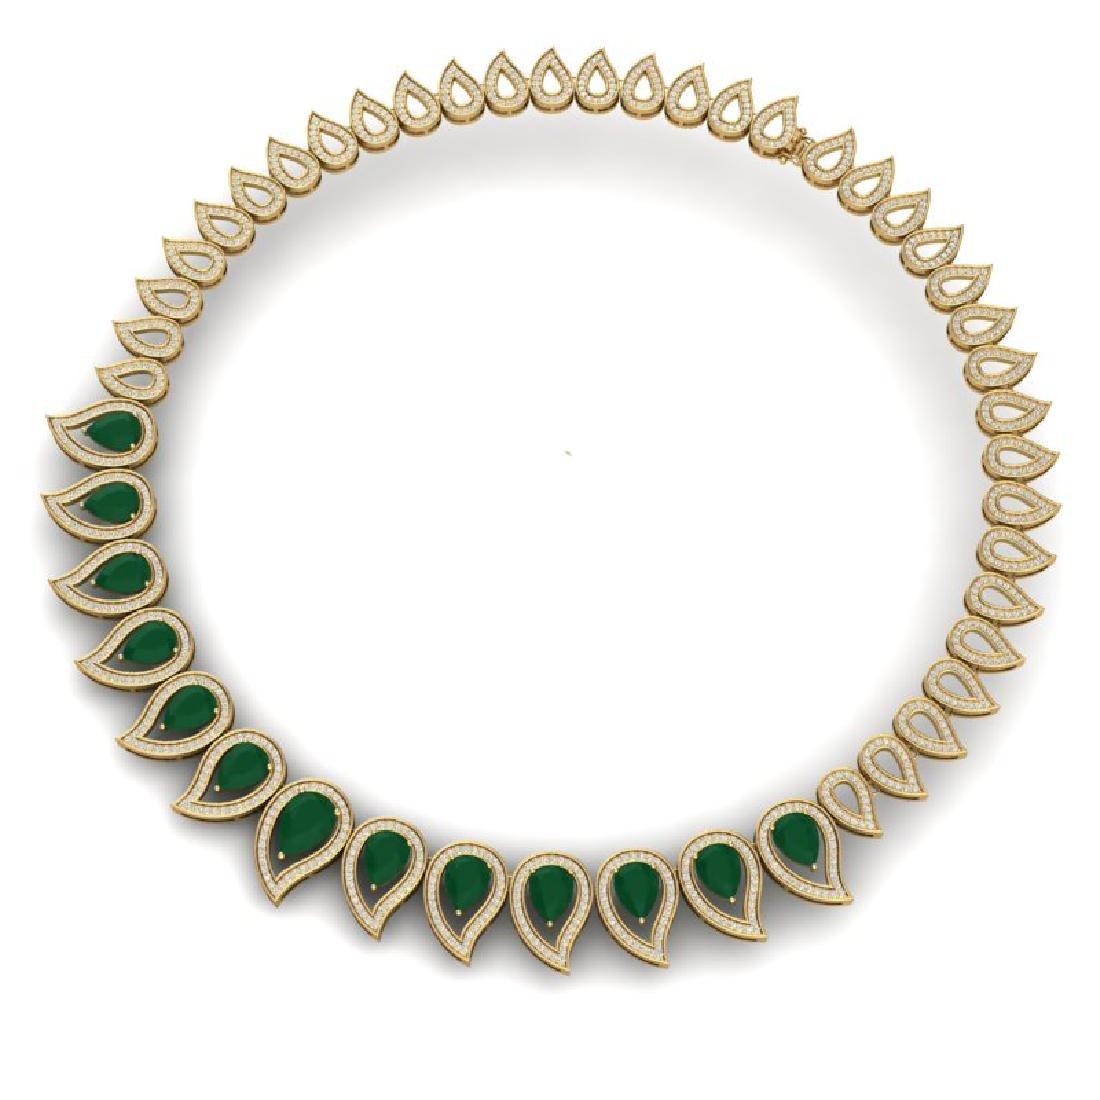 33.4 CTW Royalty Emerald & VS Diamond Necklace 18K